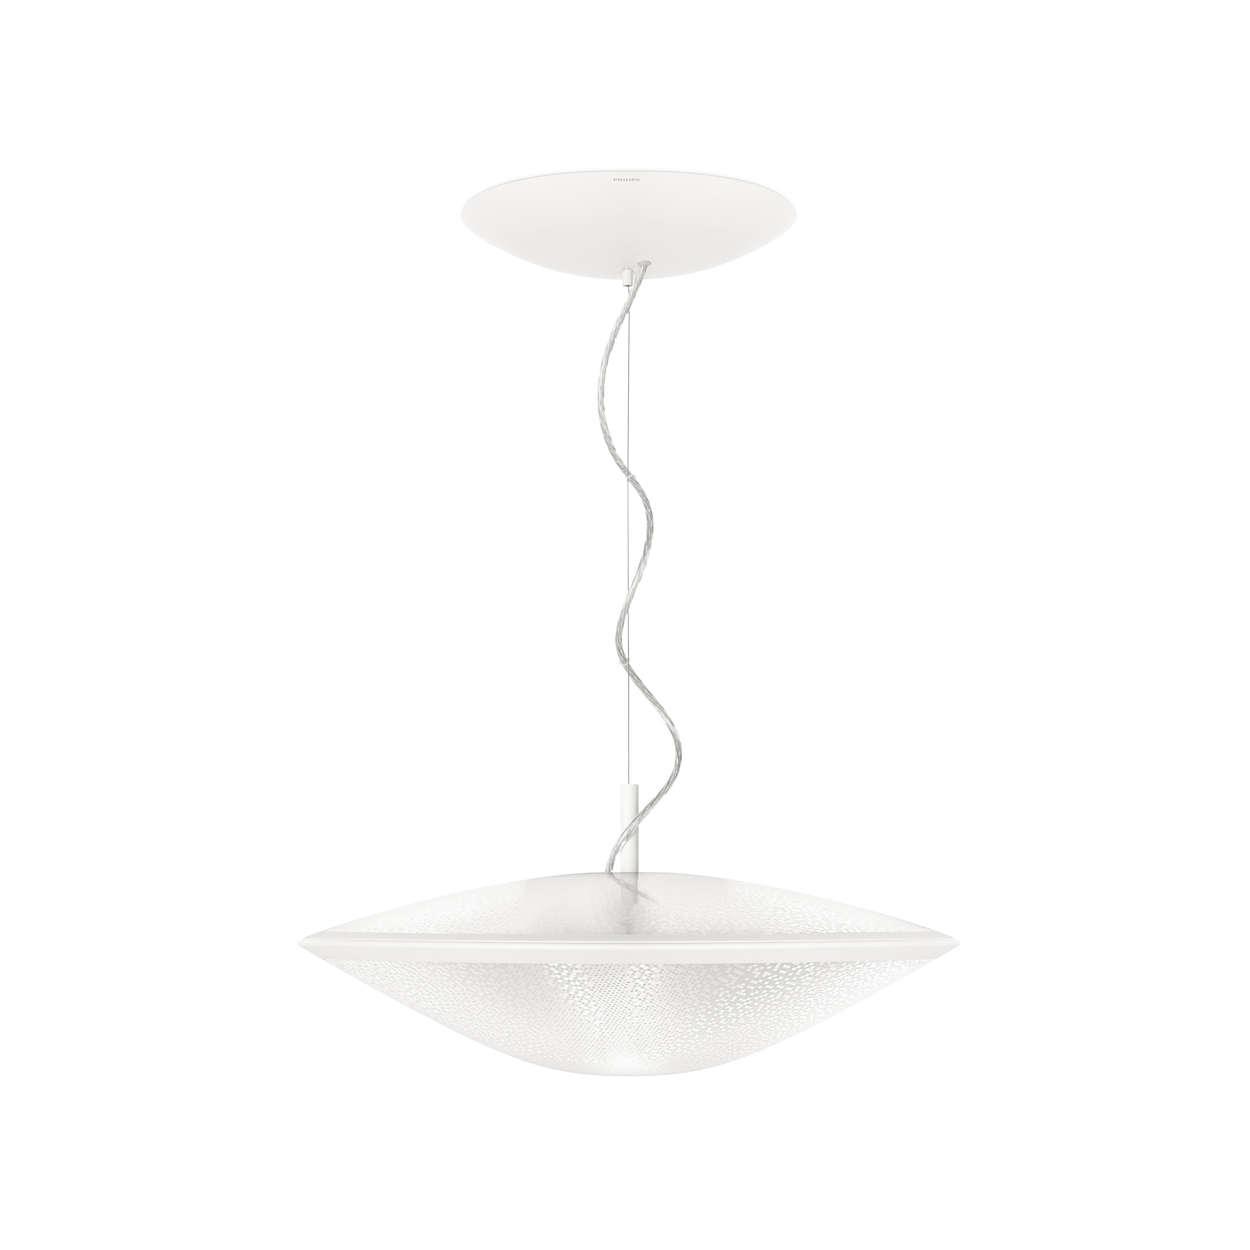 hue personal wireless lighting suspension light. Black Bedroom Furniture Sets. Home Design Ideas